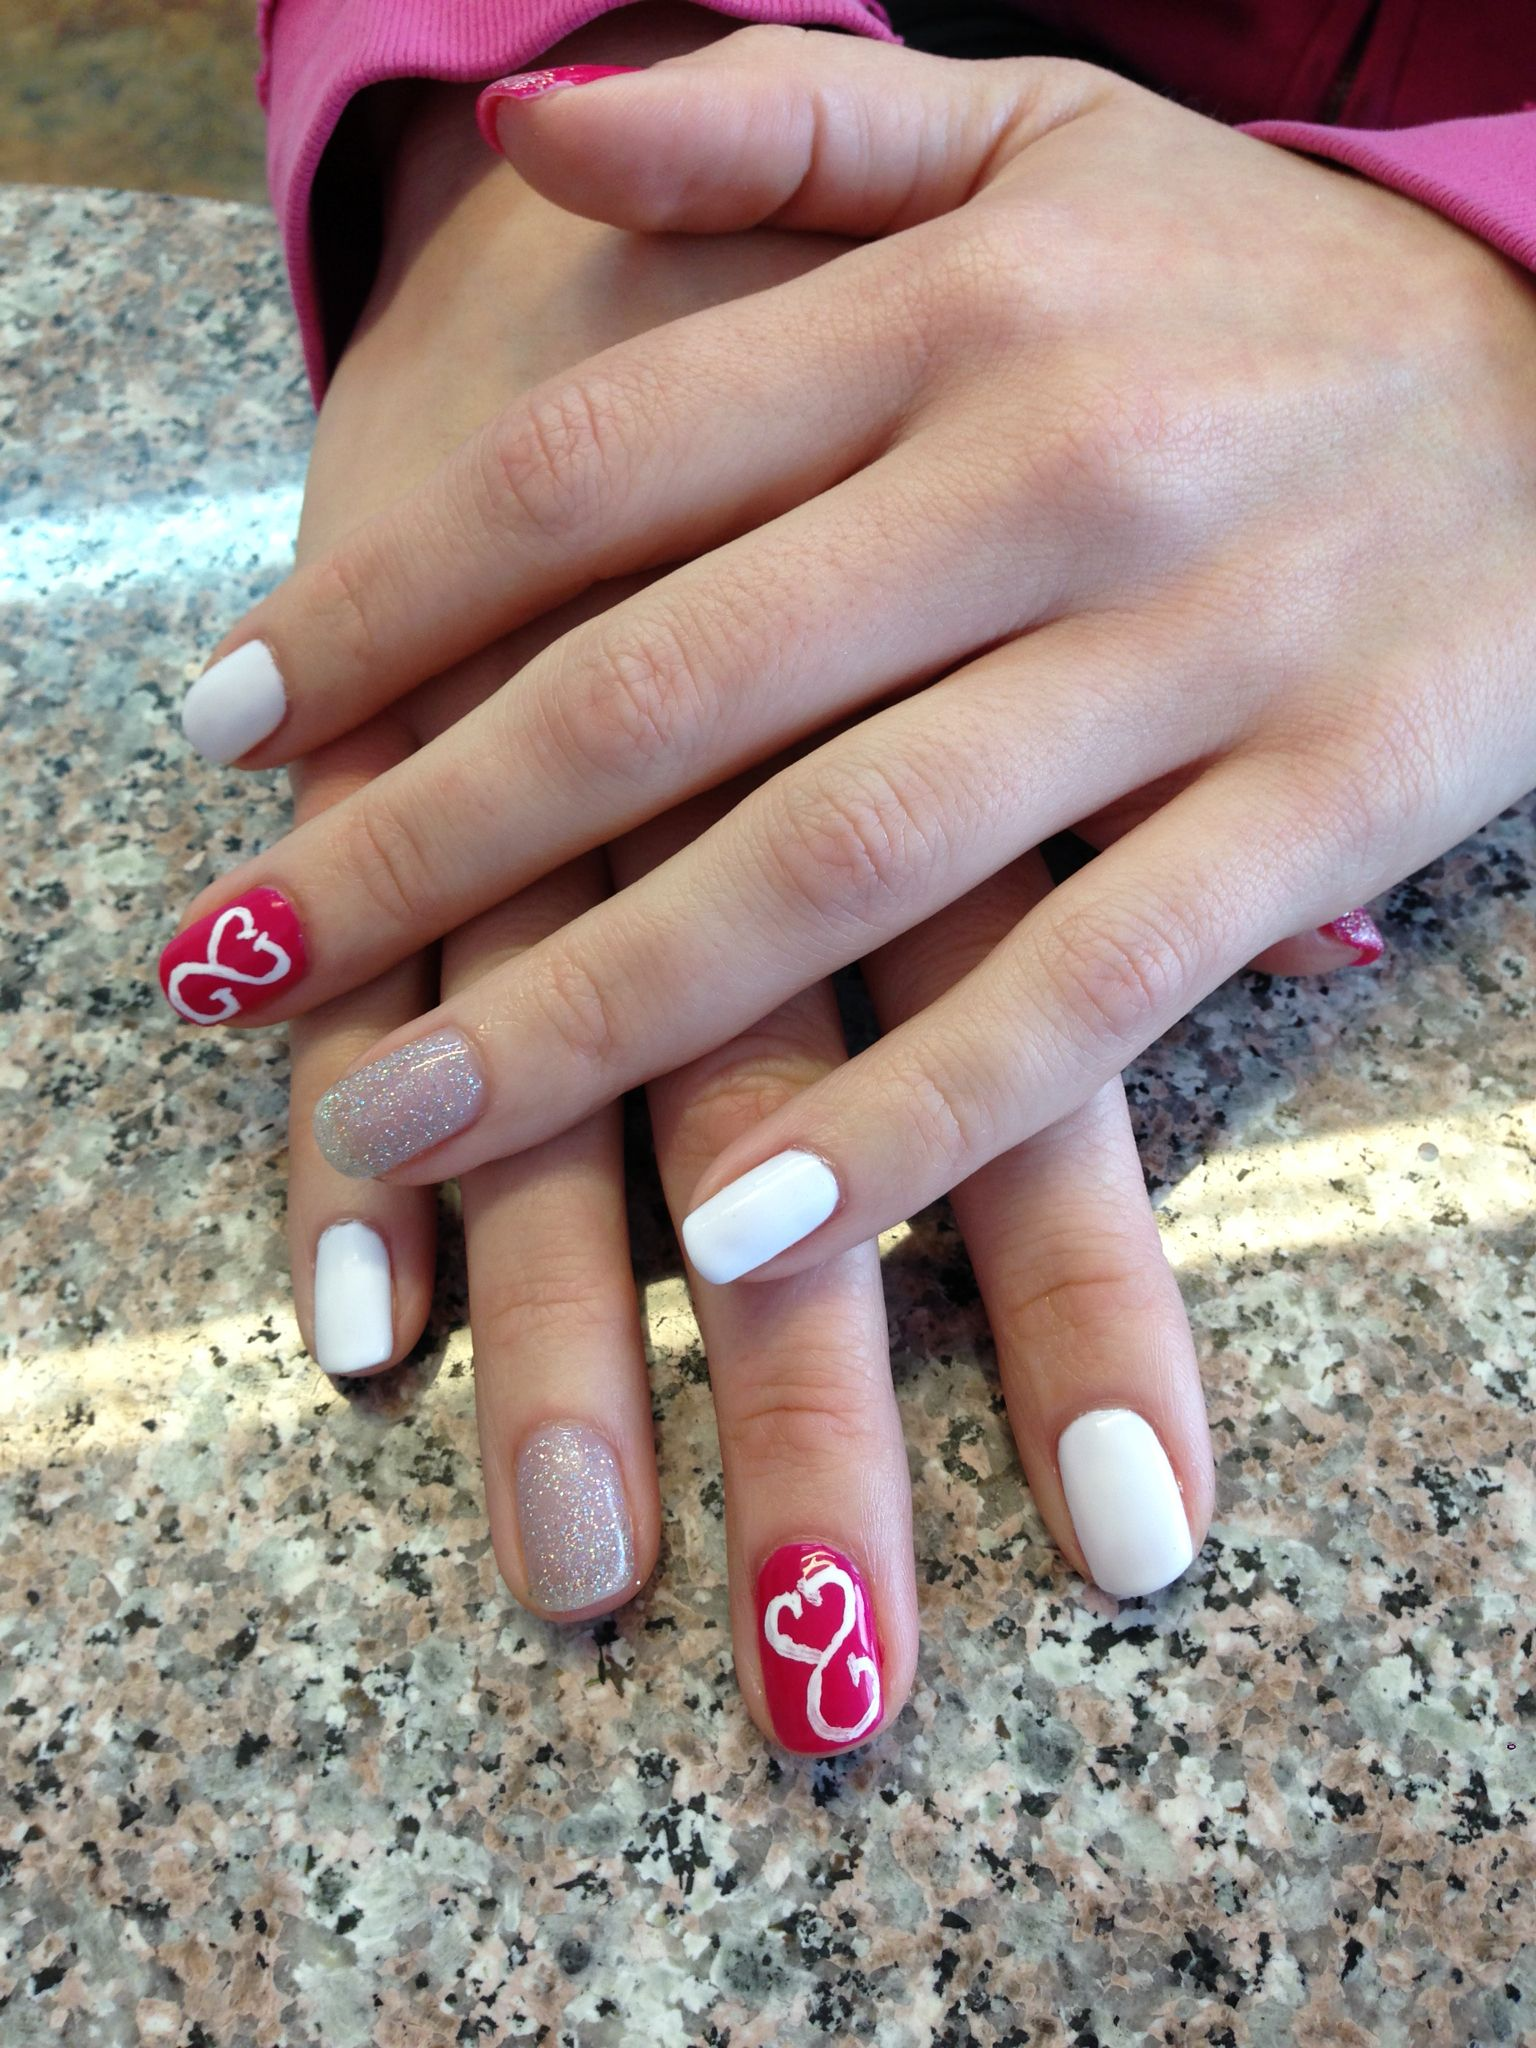 Nurse nail art paulasnaildesigns paulas nail designs nurse nail art paulasnaildesigns prinsesfo Image collections